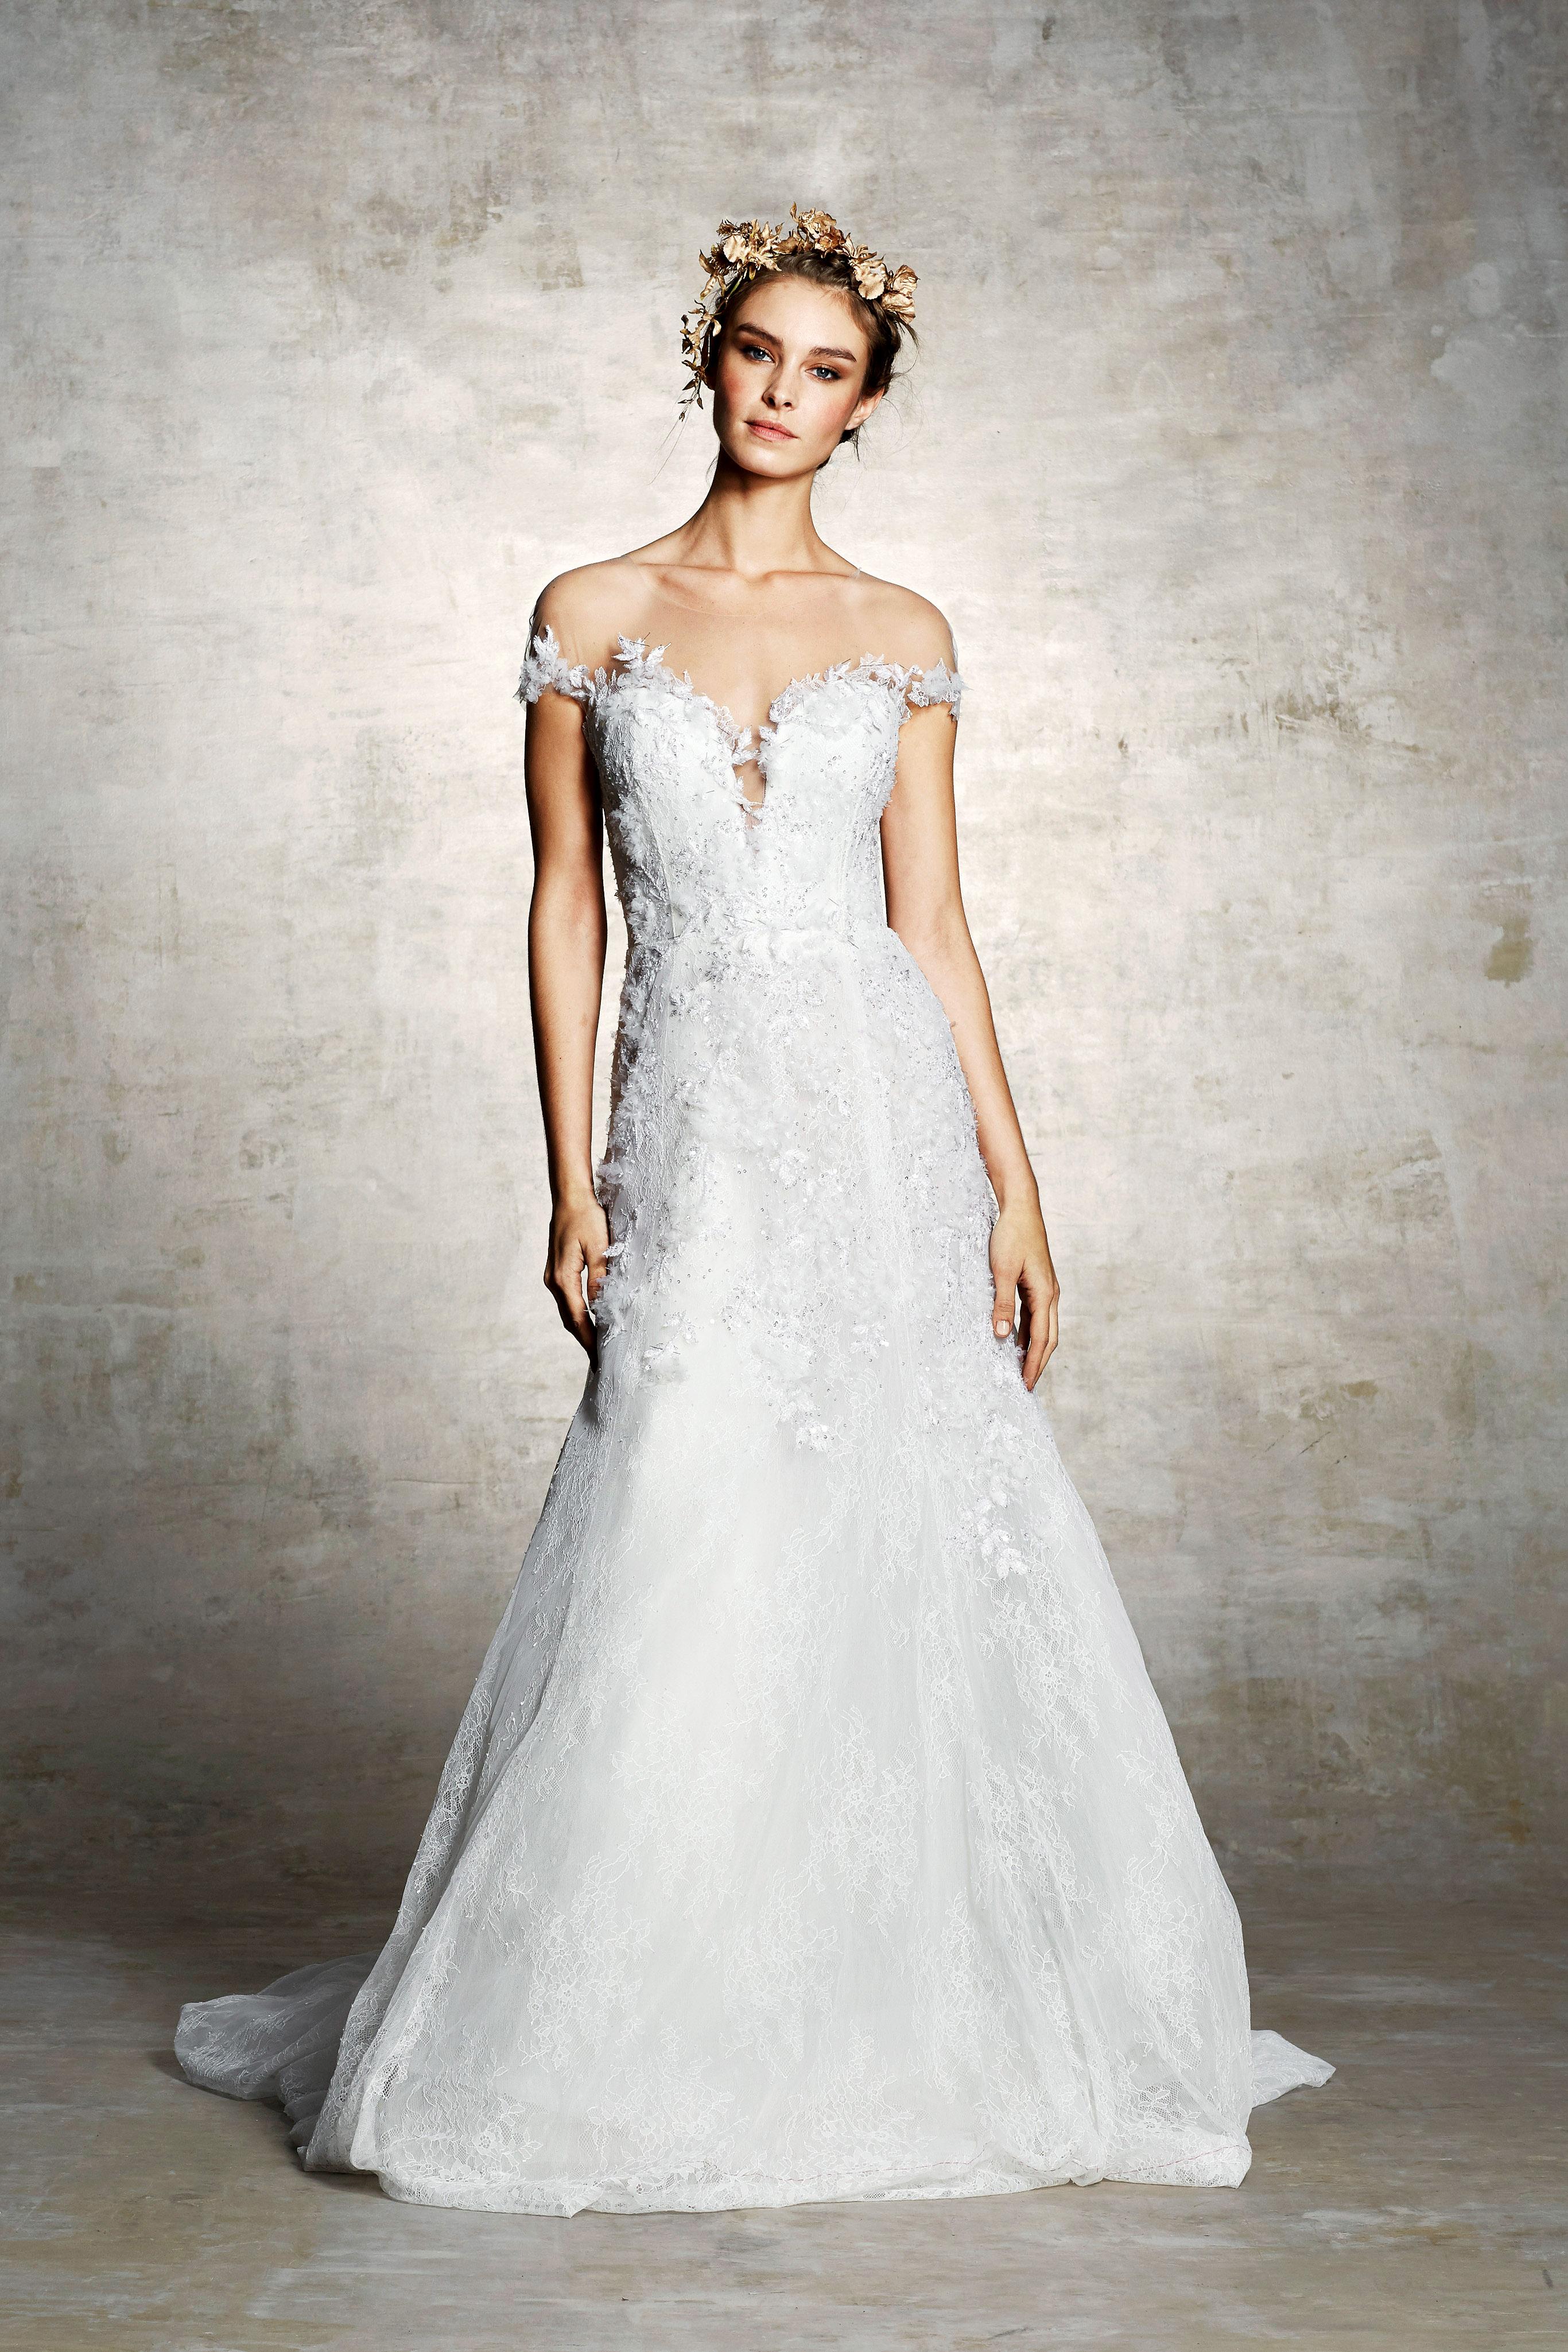 marchesa bridal wedding dress off the shoulder a-line floral embroidery